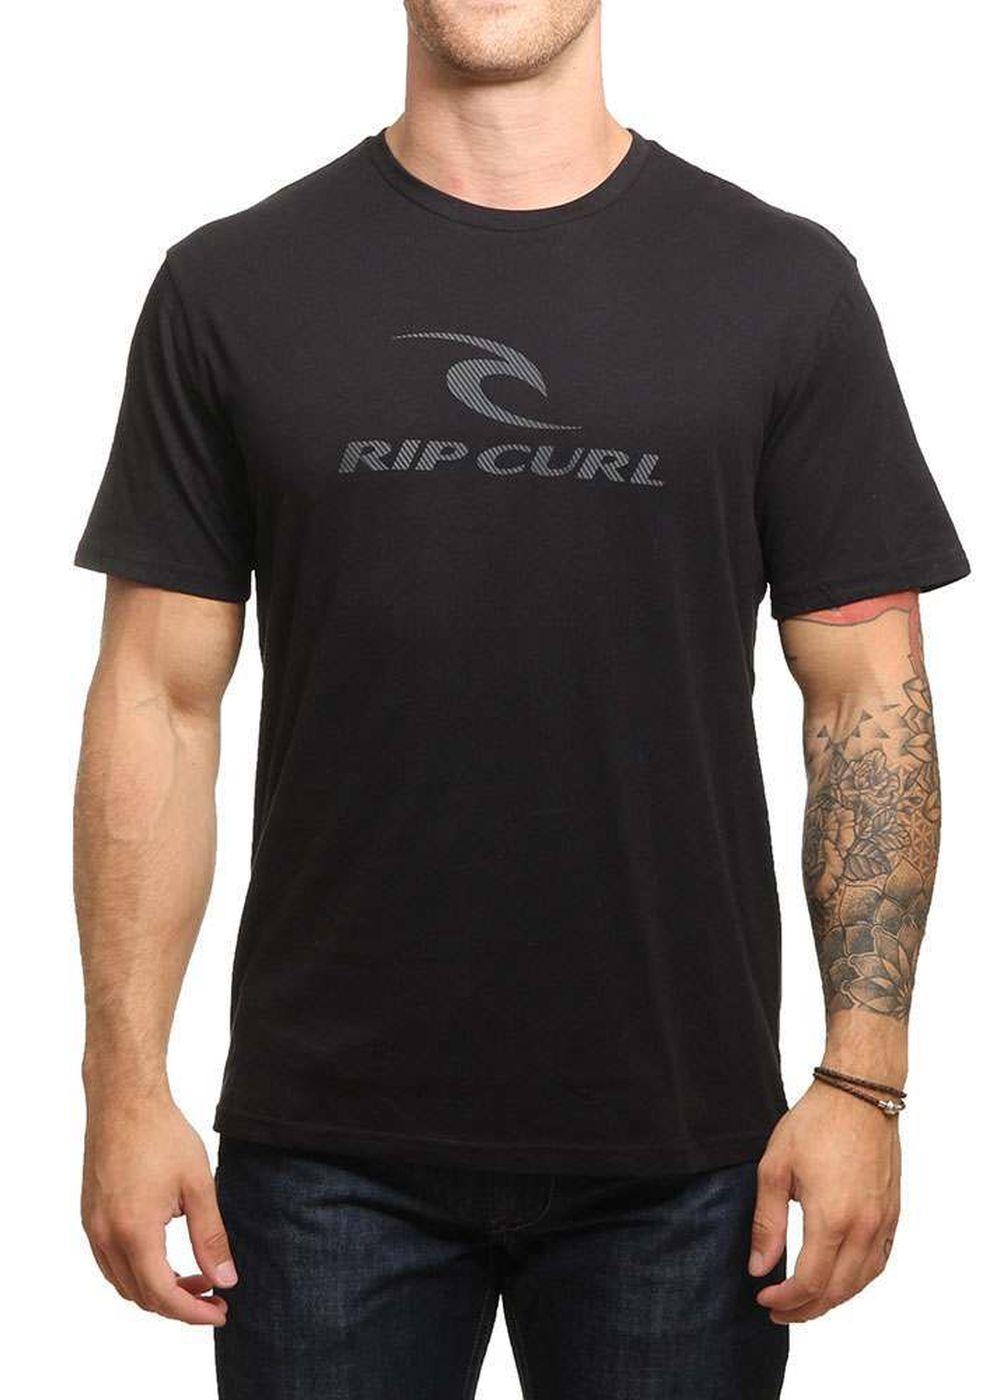 ripcurl-marky-tee-black